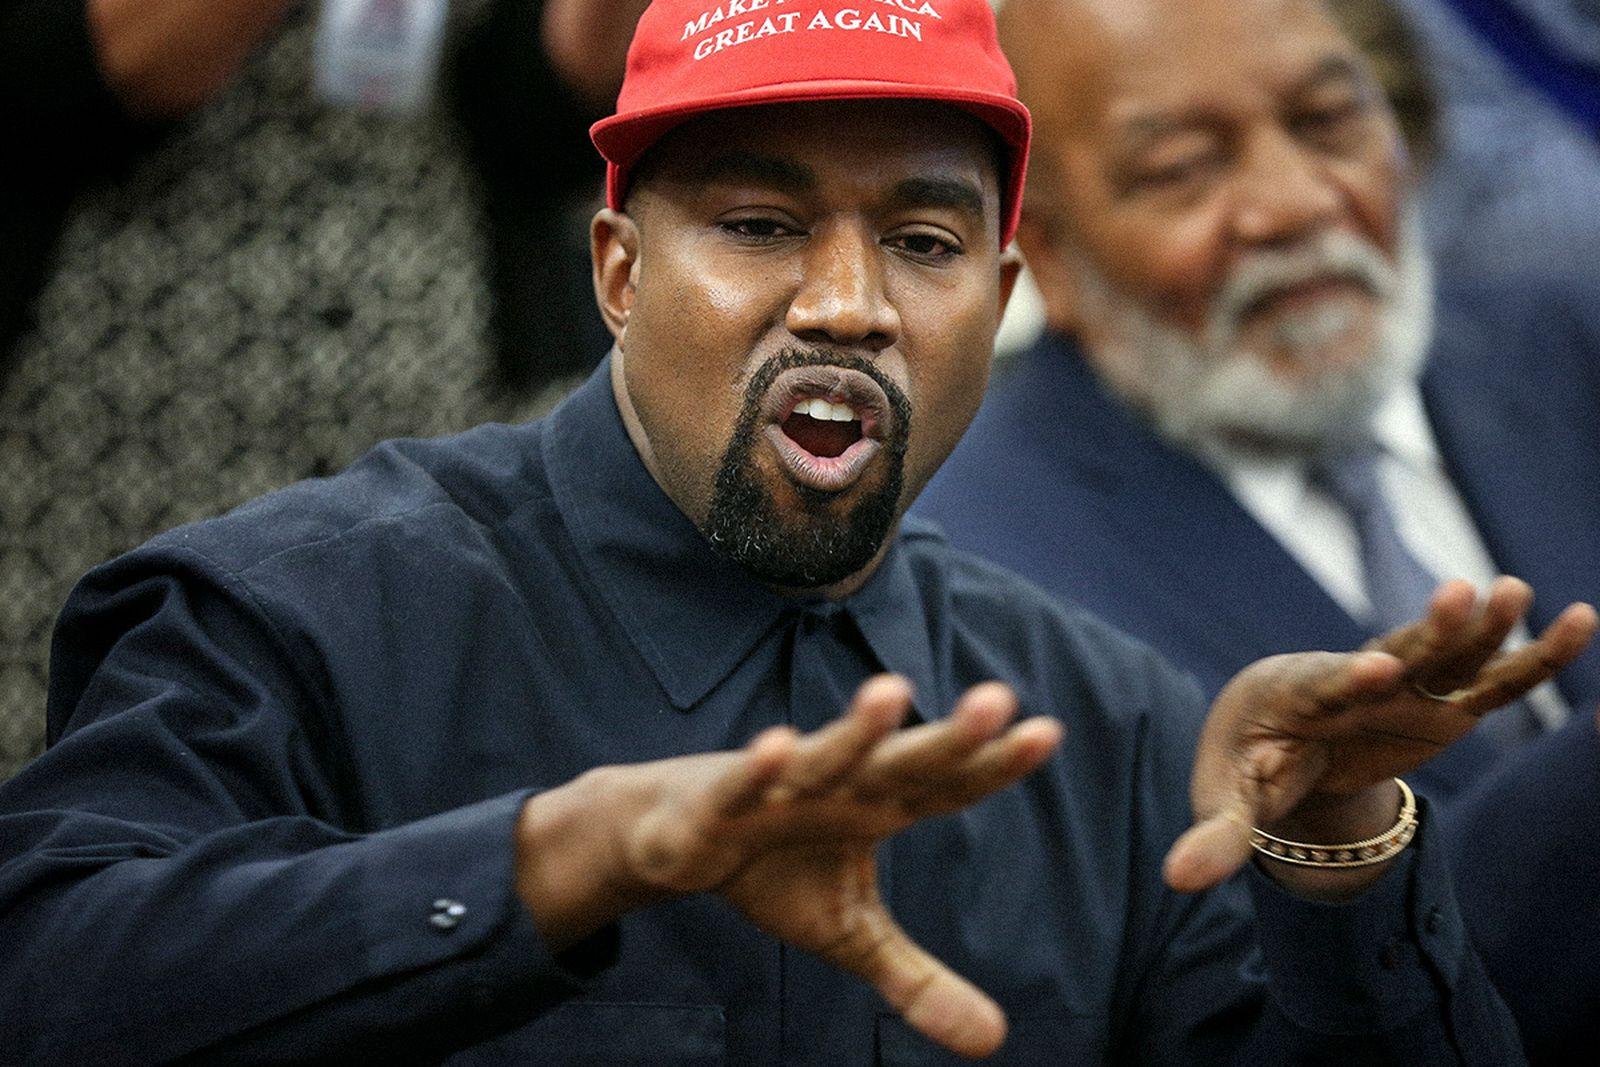 kanye-west-election-fraud-main